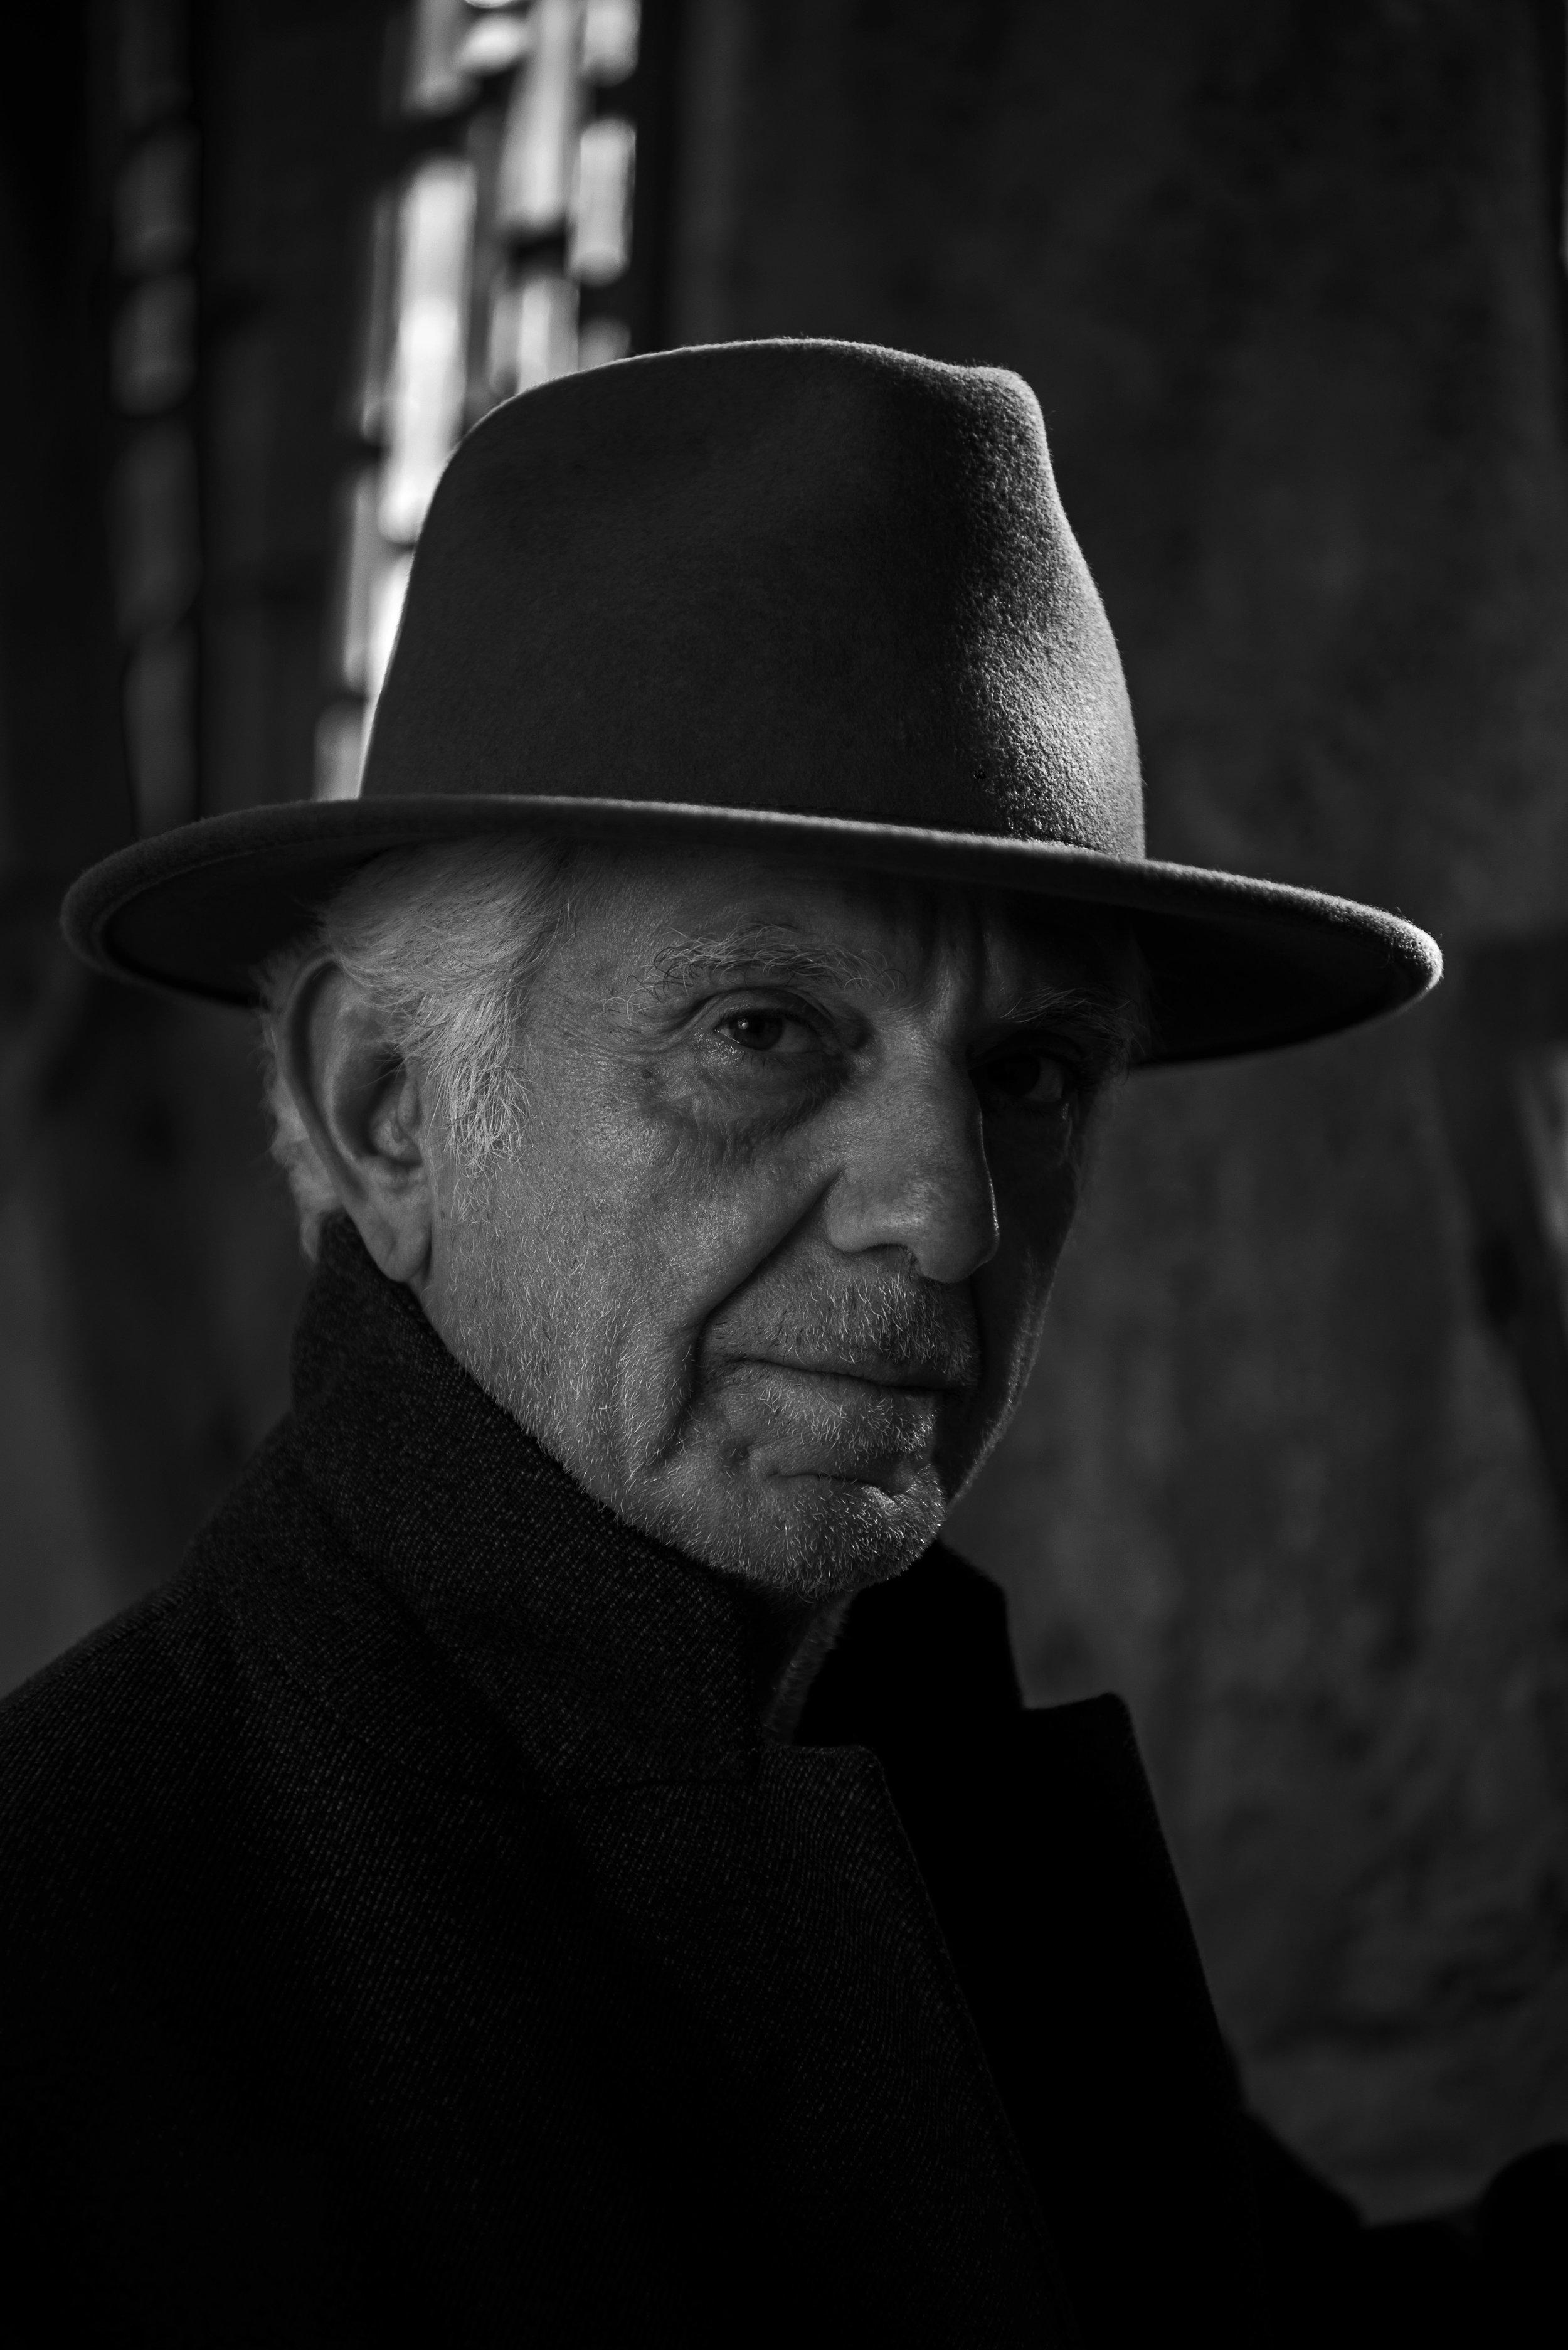 Maurice Marciano    photos by Ian Morrison   Fashion credits:   ERMENEGILDO ZEGNA COUTURE  coat and  JOSETTE & BERNARD  hat.